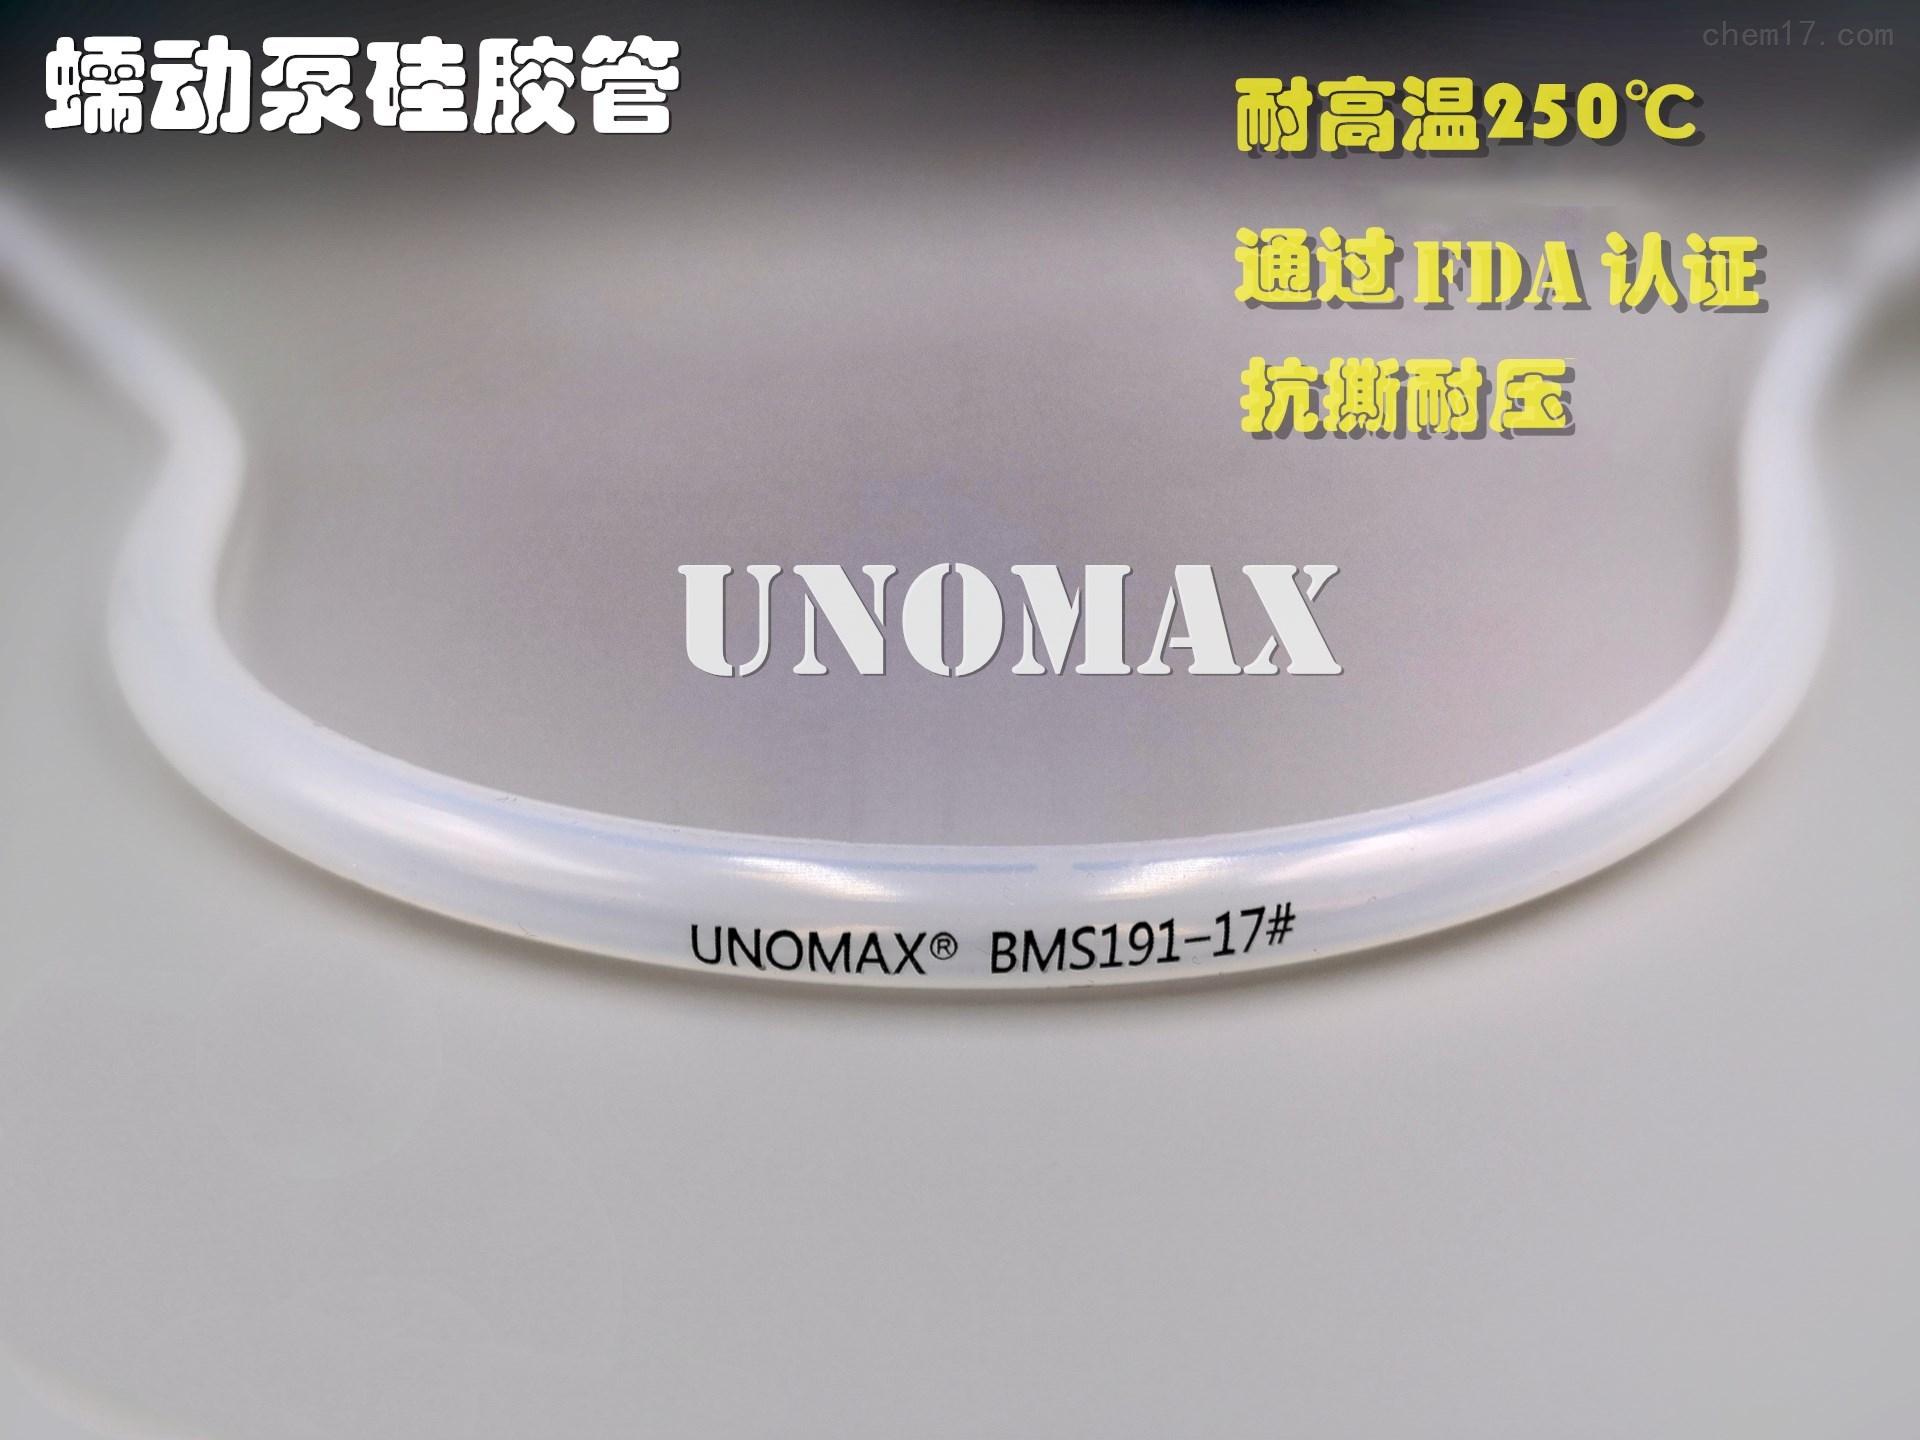 UNOMAX友迈蠕动泵硅胶管透明耐高温高压抗撕